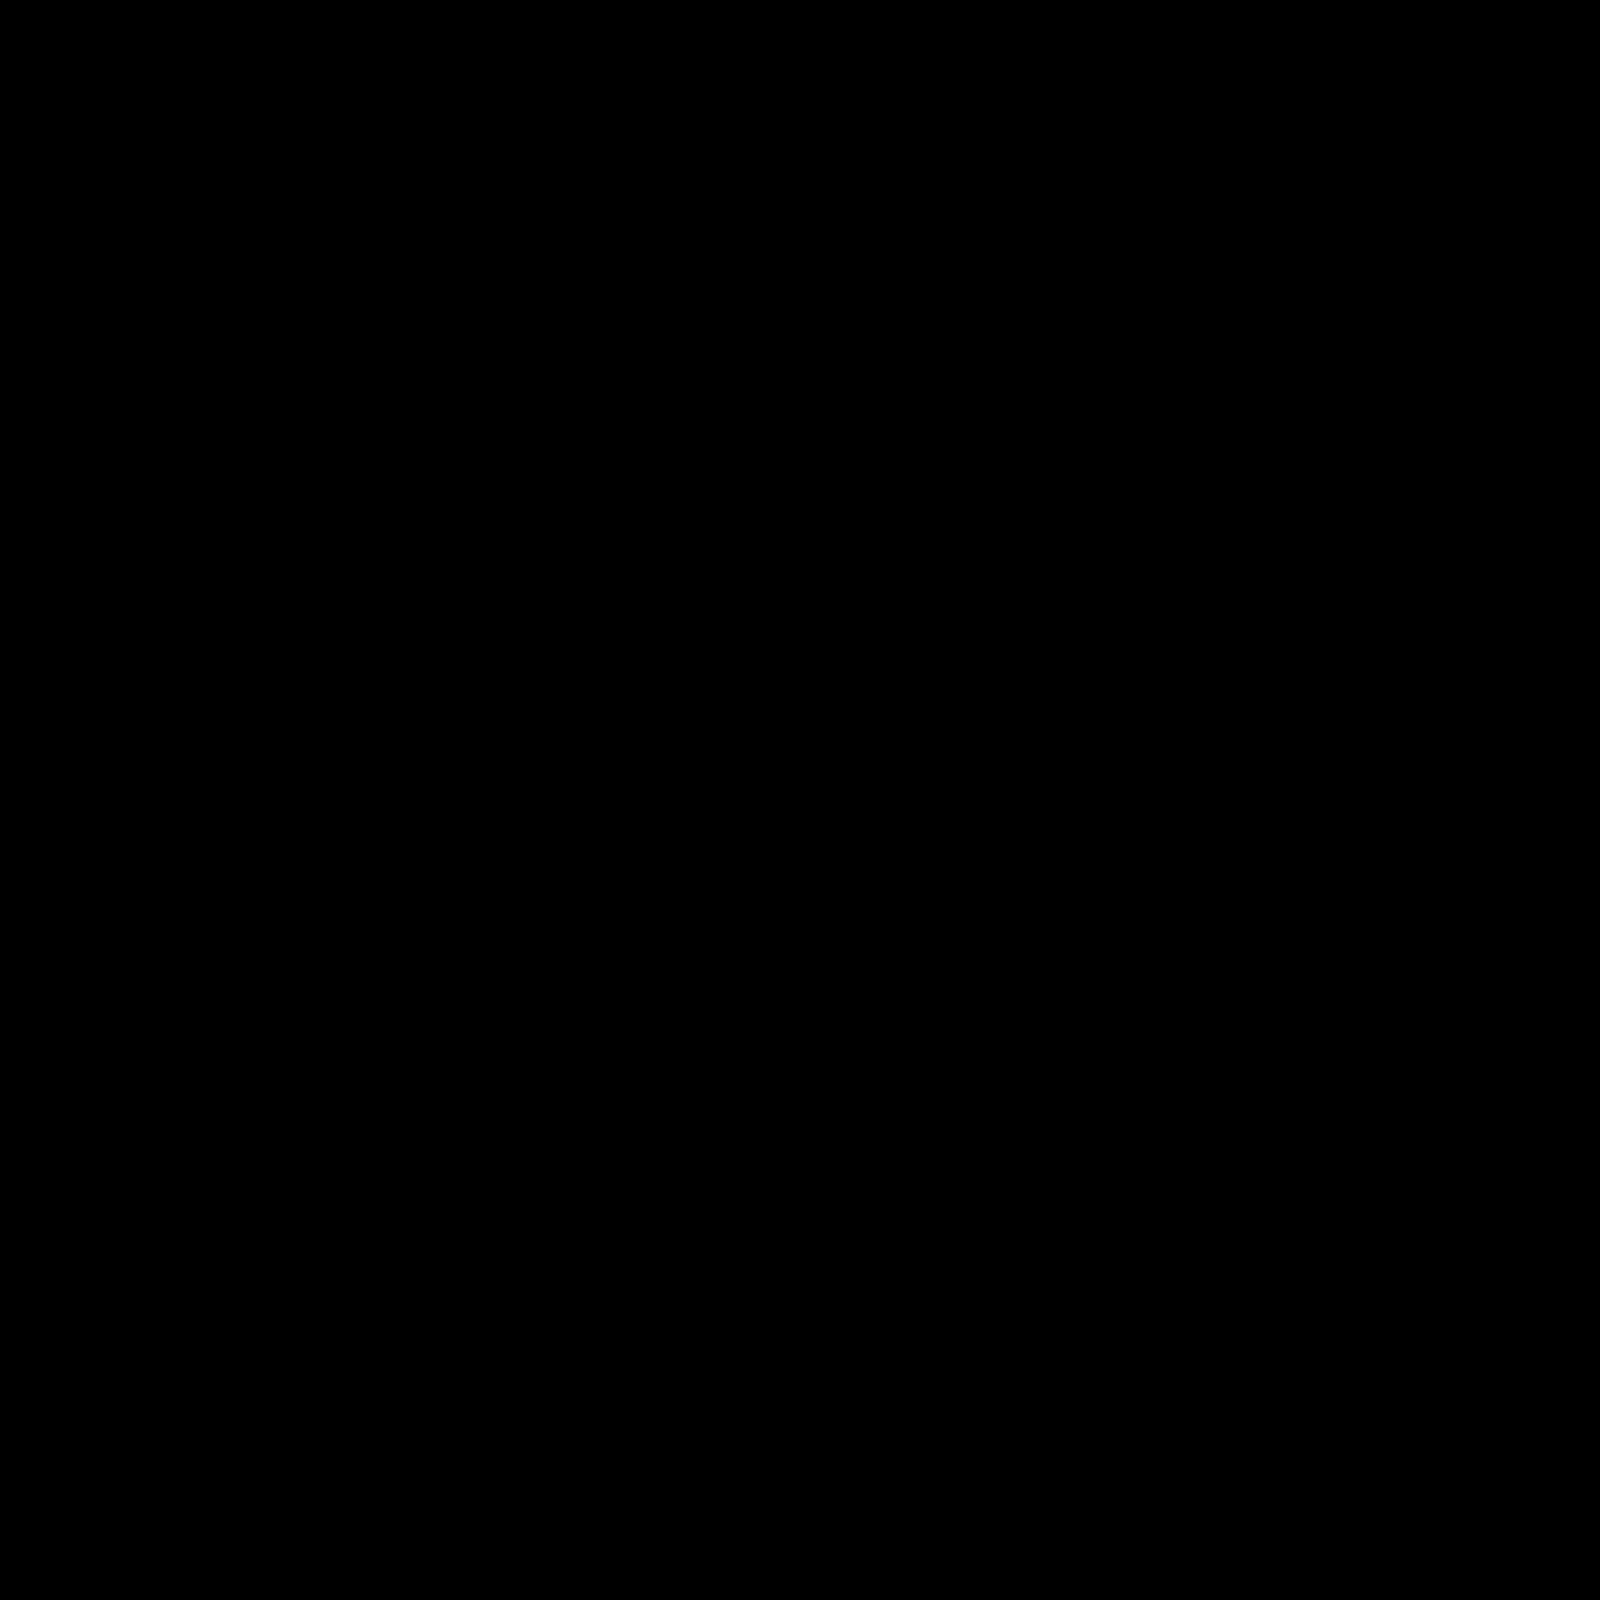 106x145